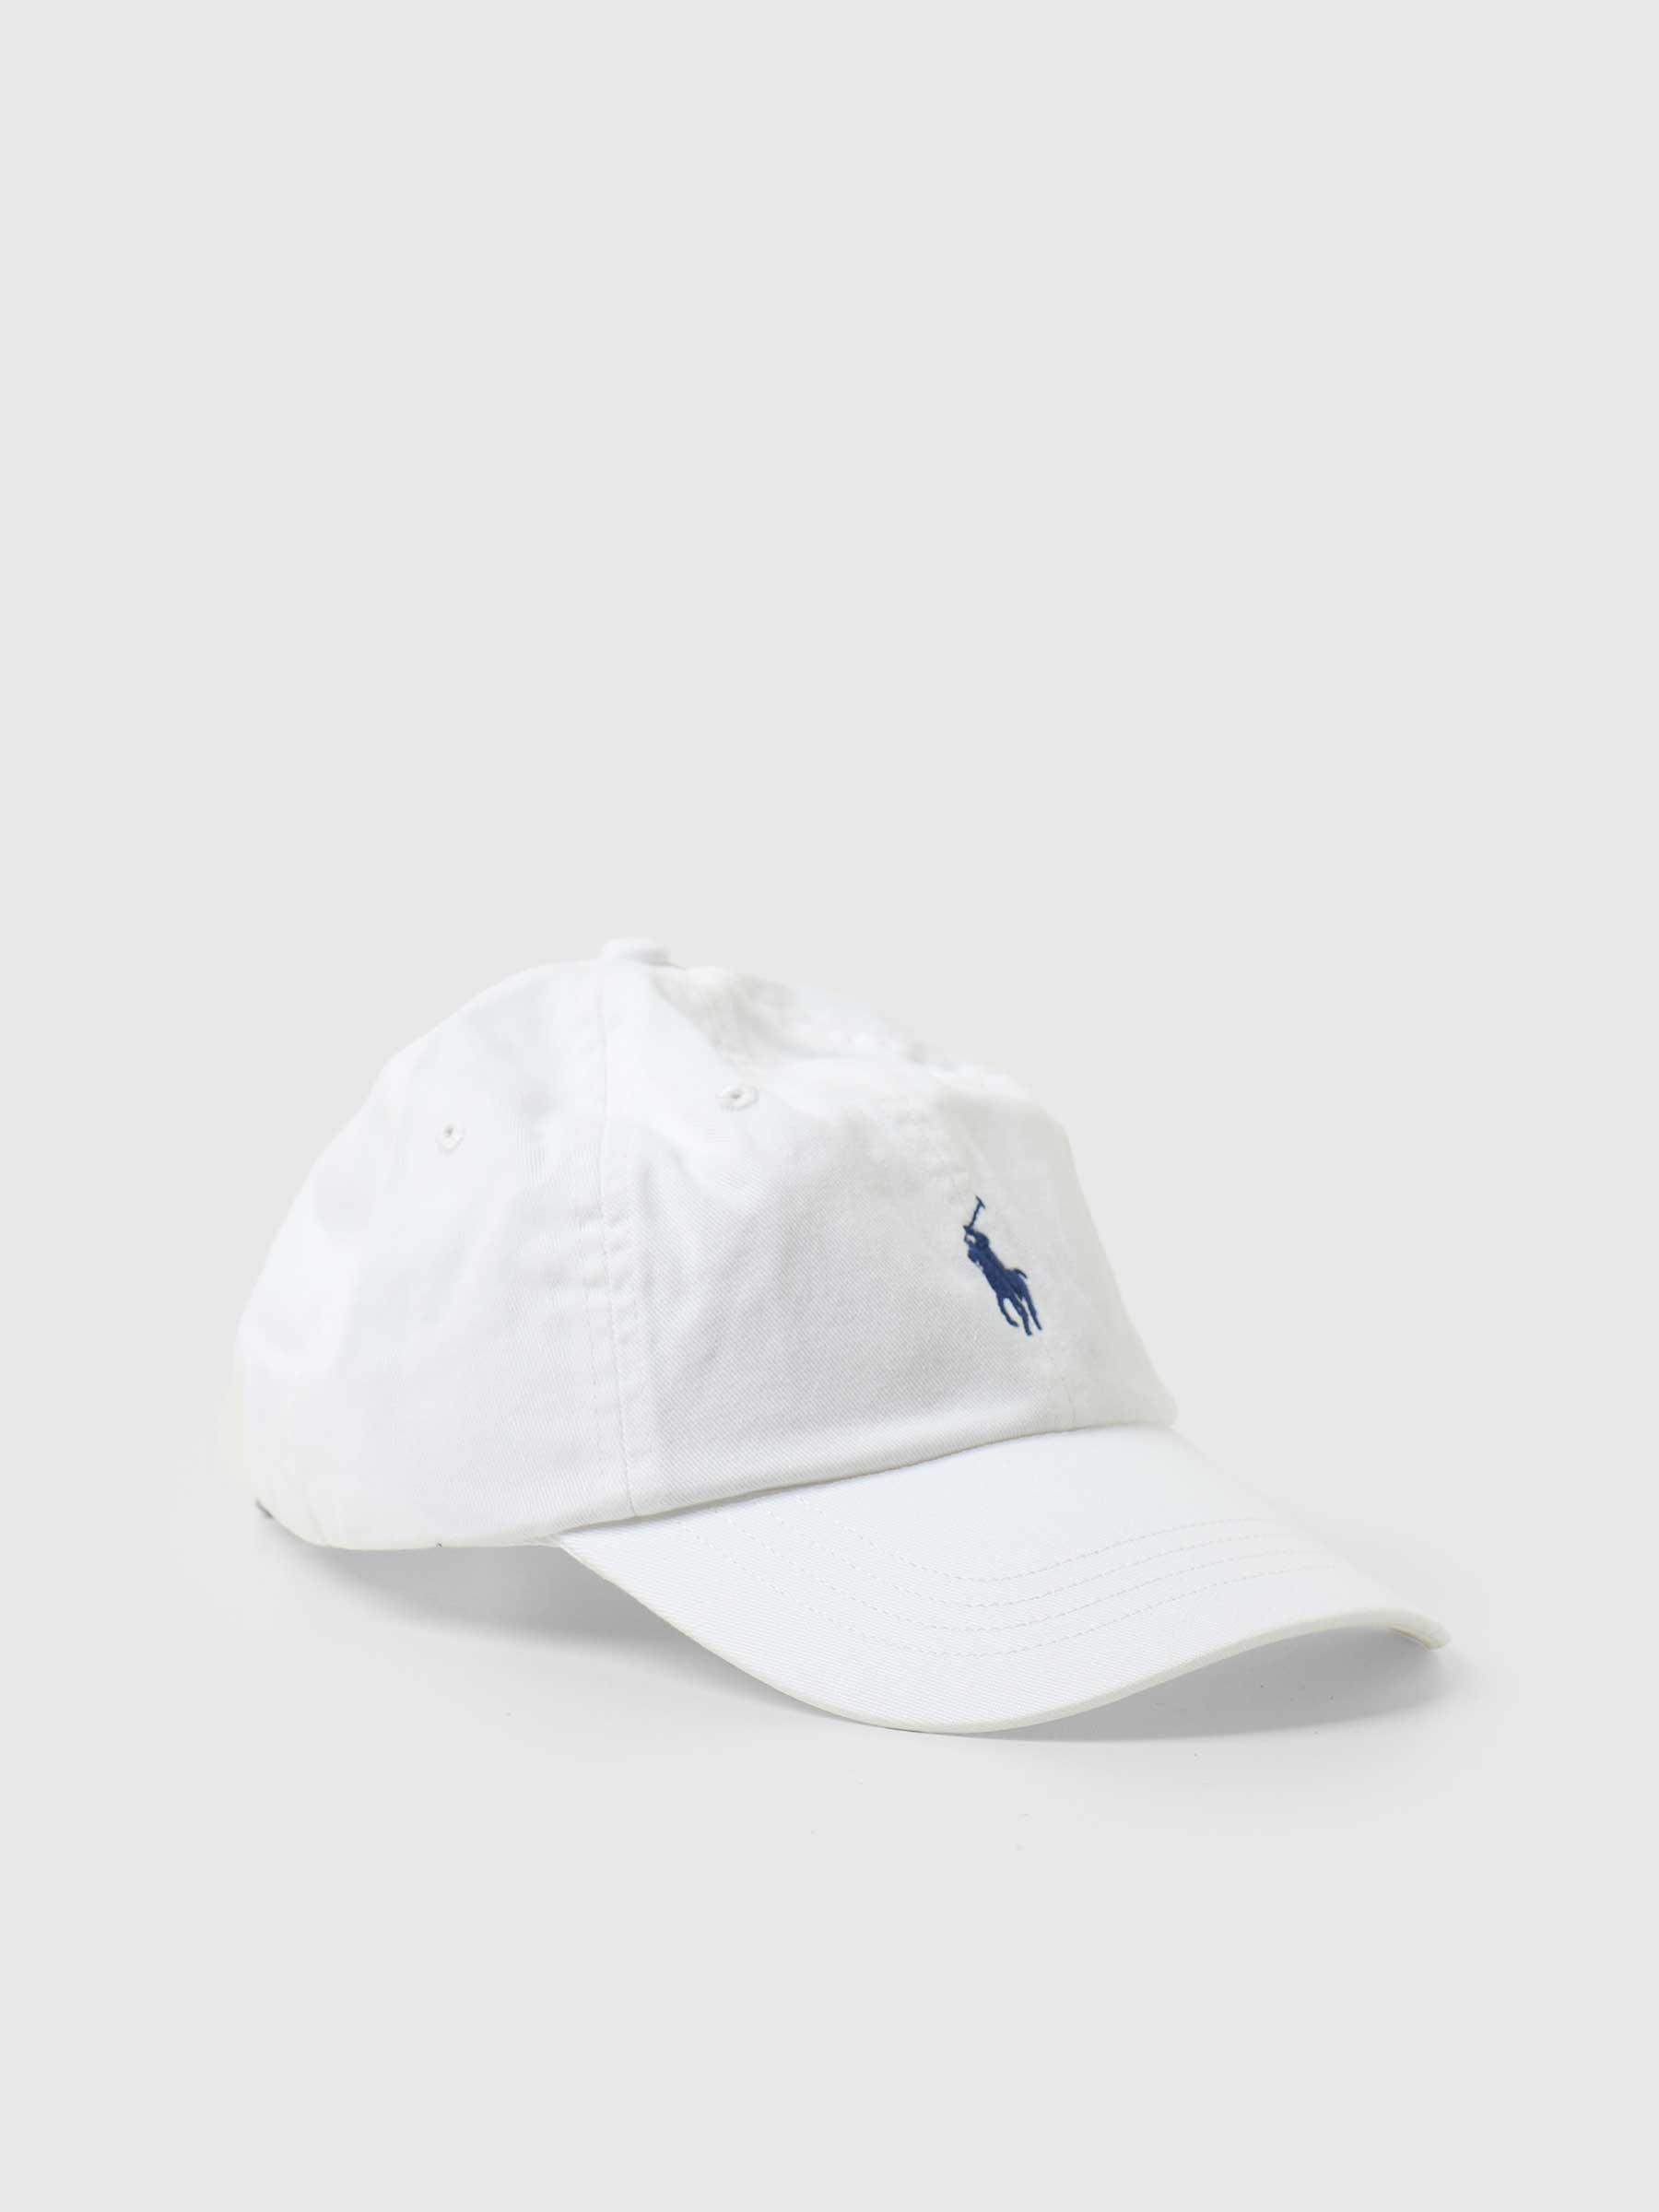 Sport Cap Hat White Marlin Blue 710548524001